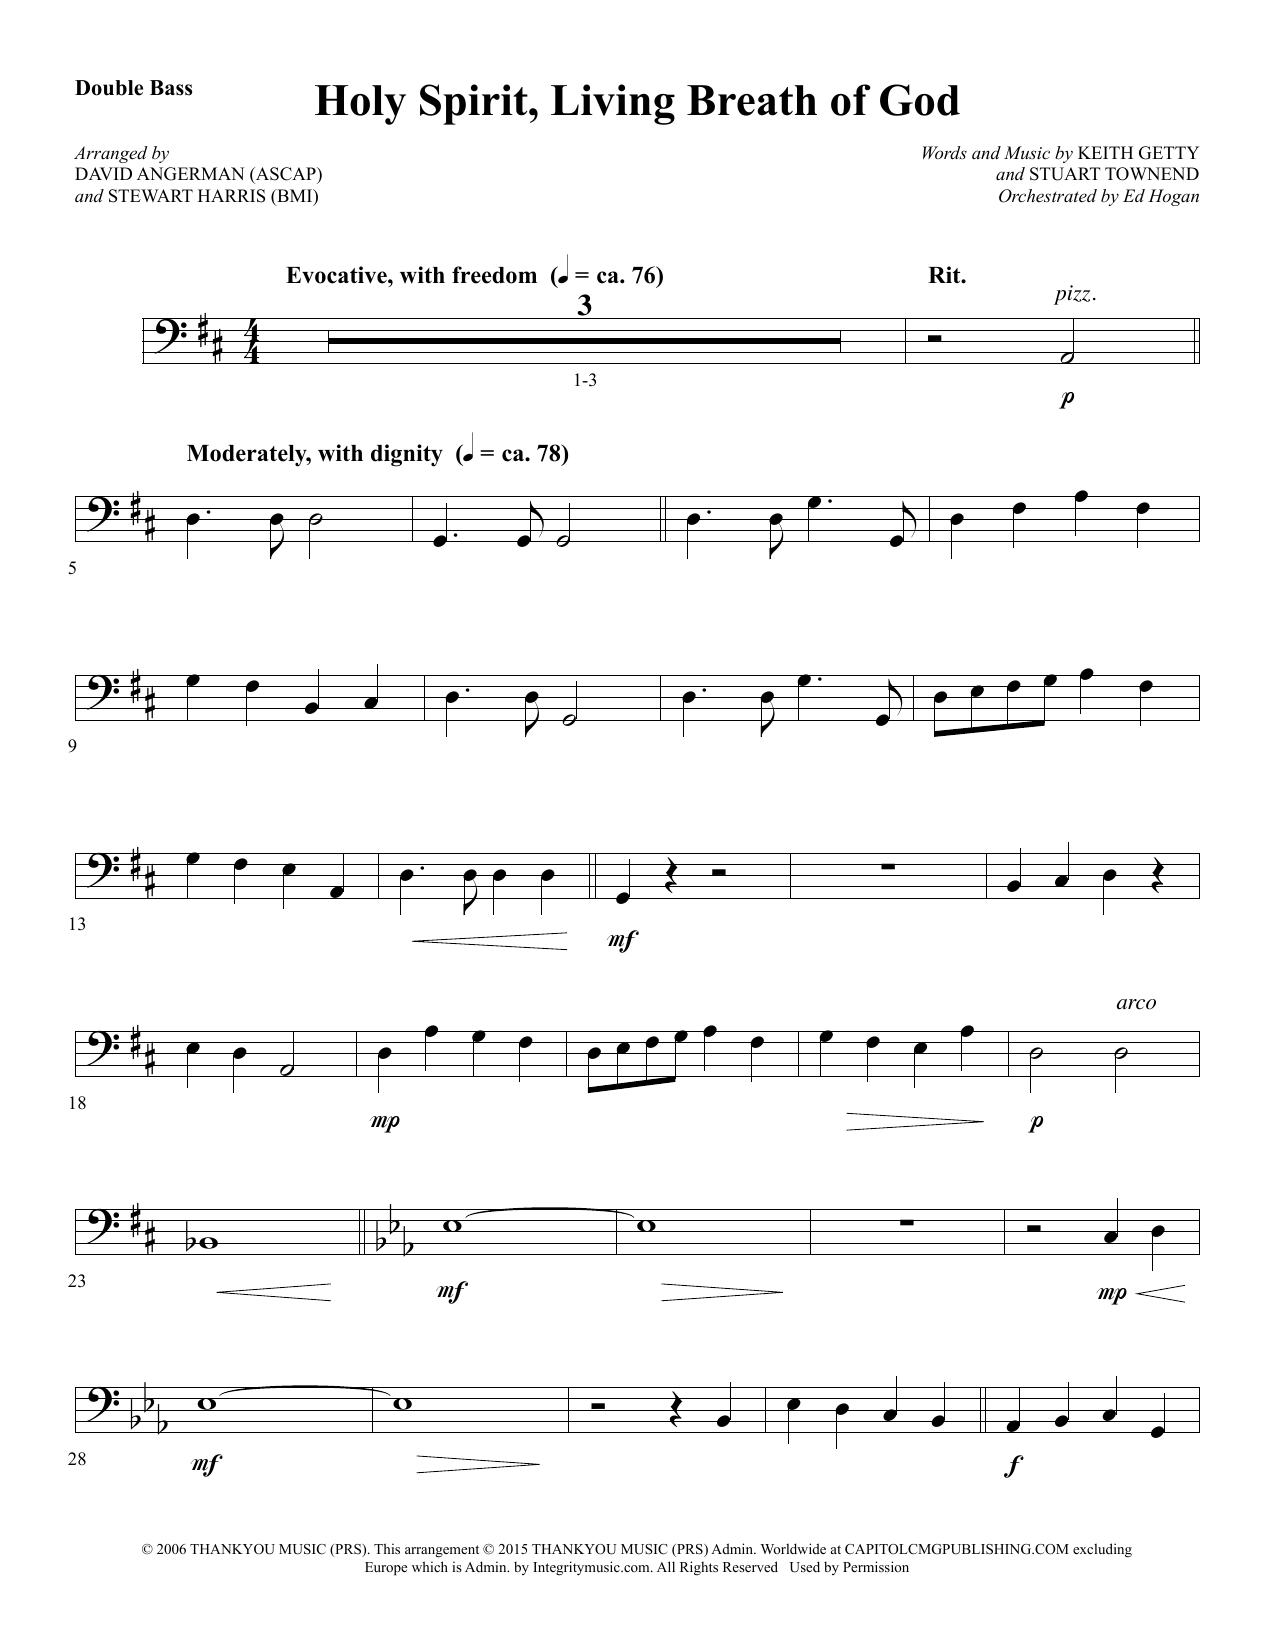 Holy Spirit, Living Breath of God - Double Bass sheet music